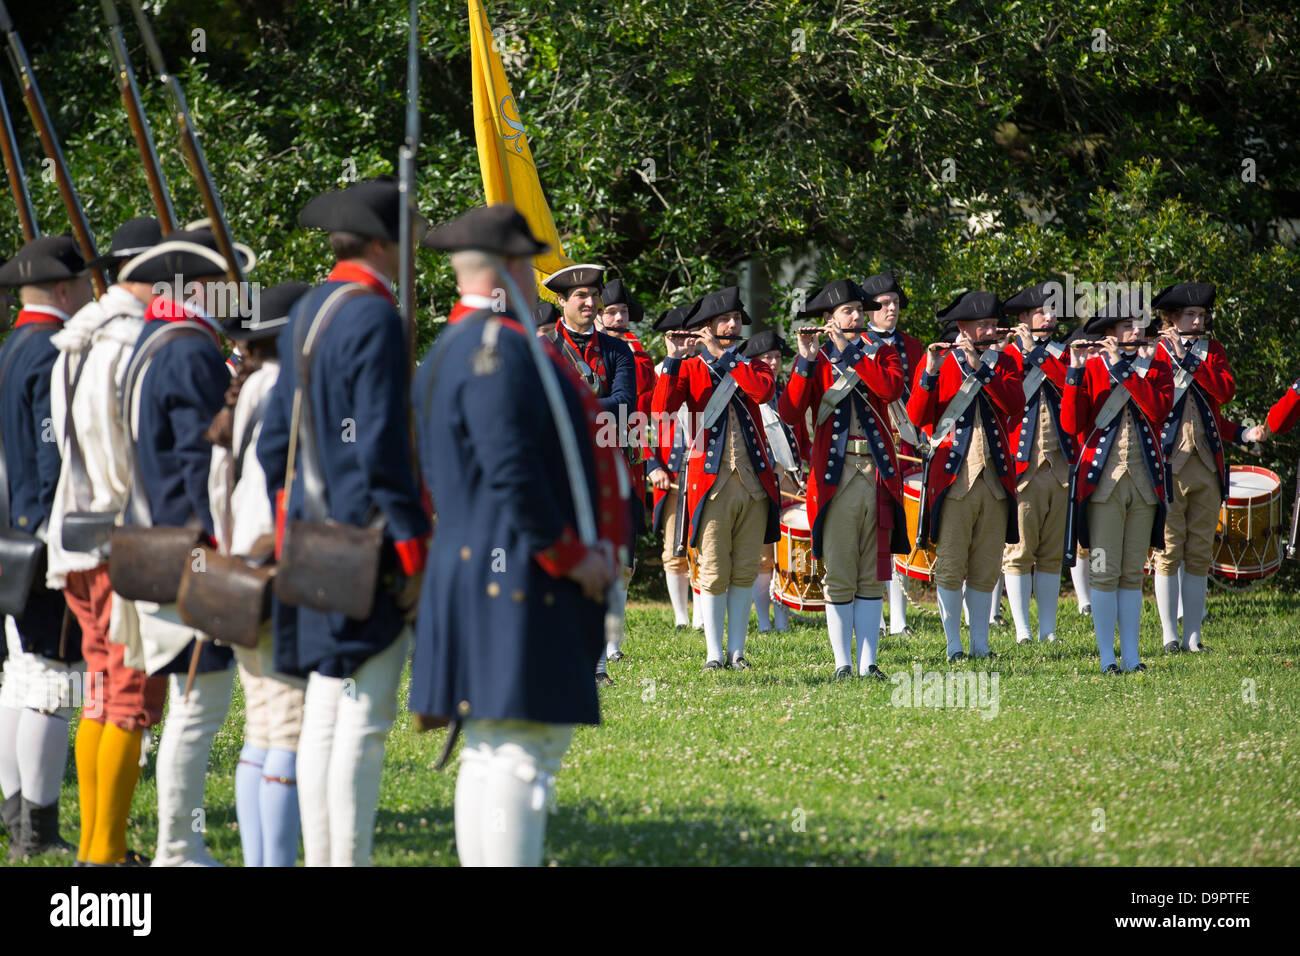 Revolutionary War reenactment at Colonial Williamsburg, Virginia, USA - Stock Image